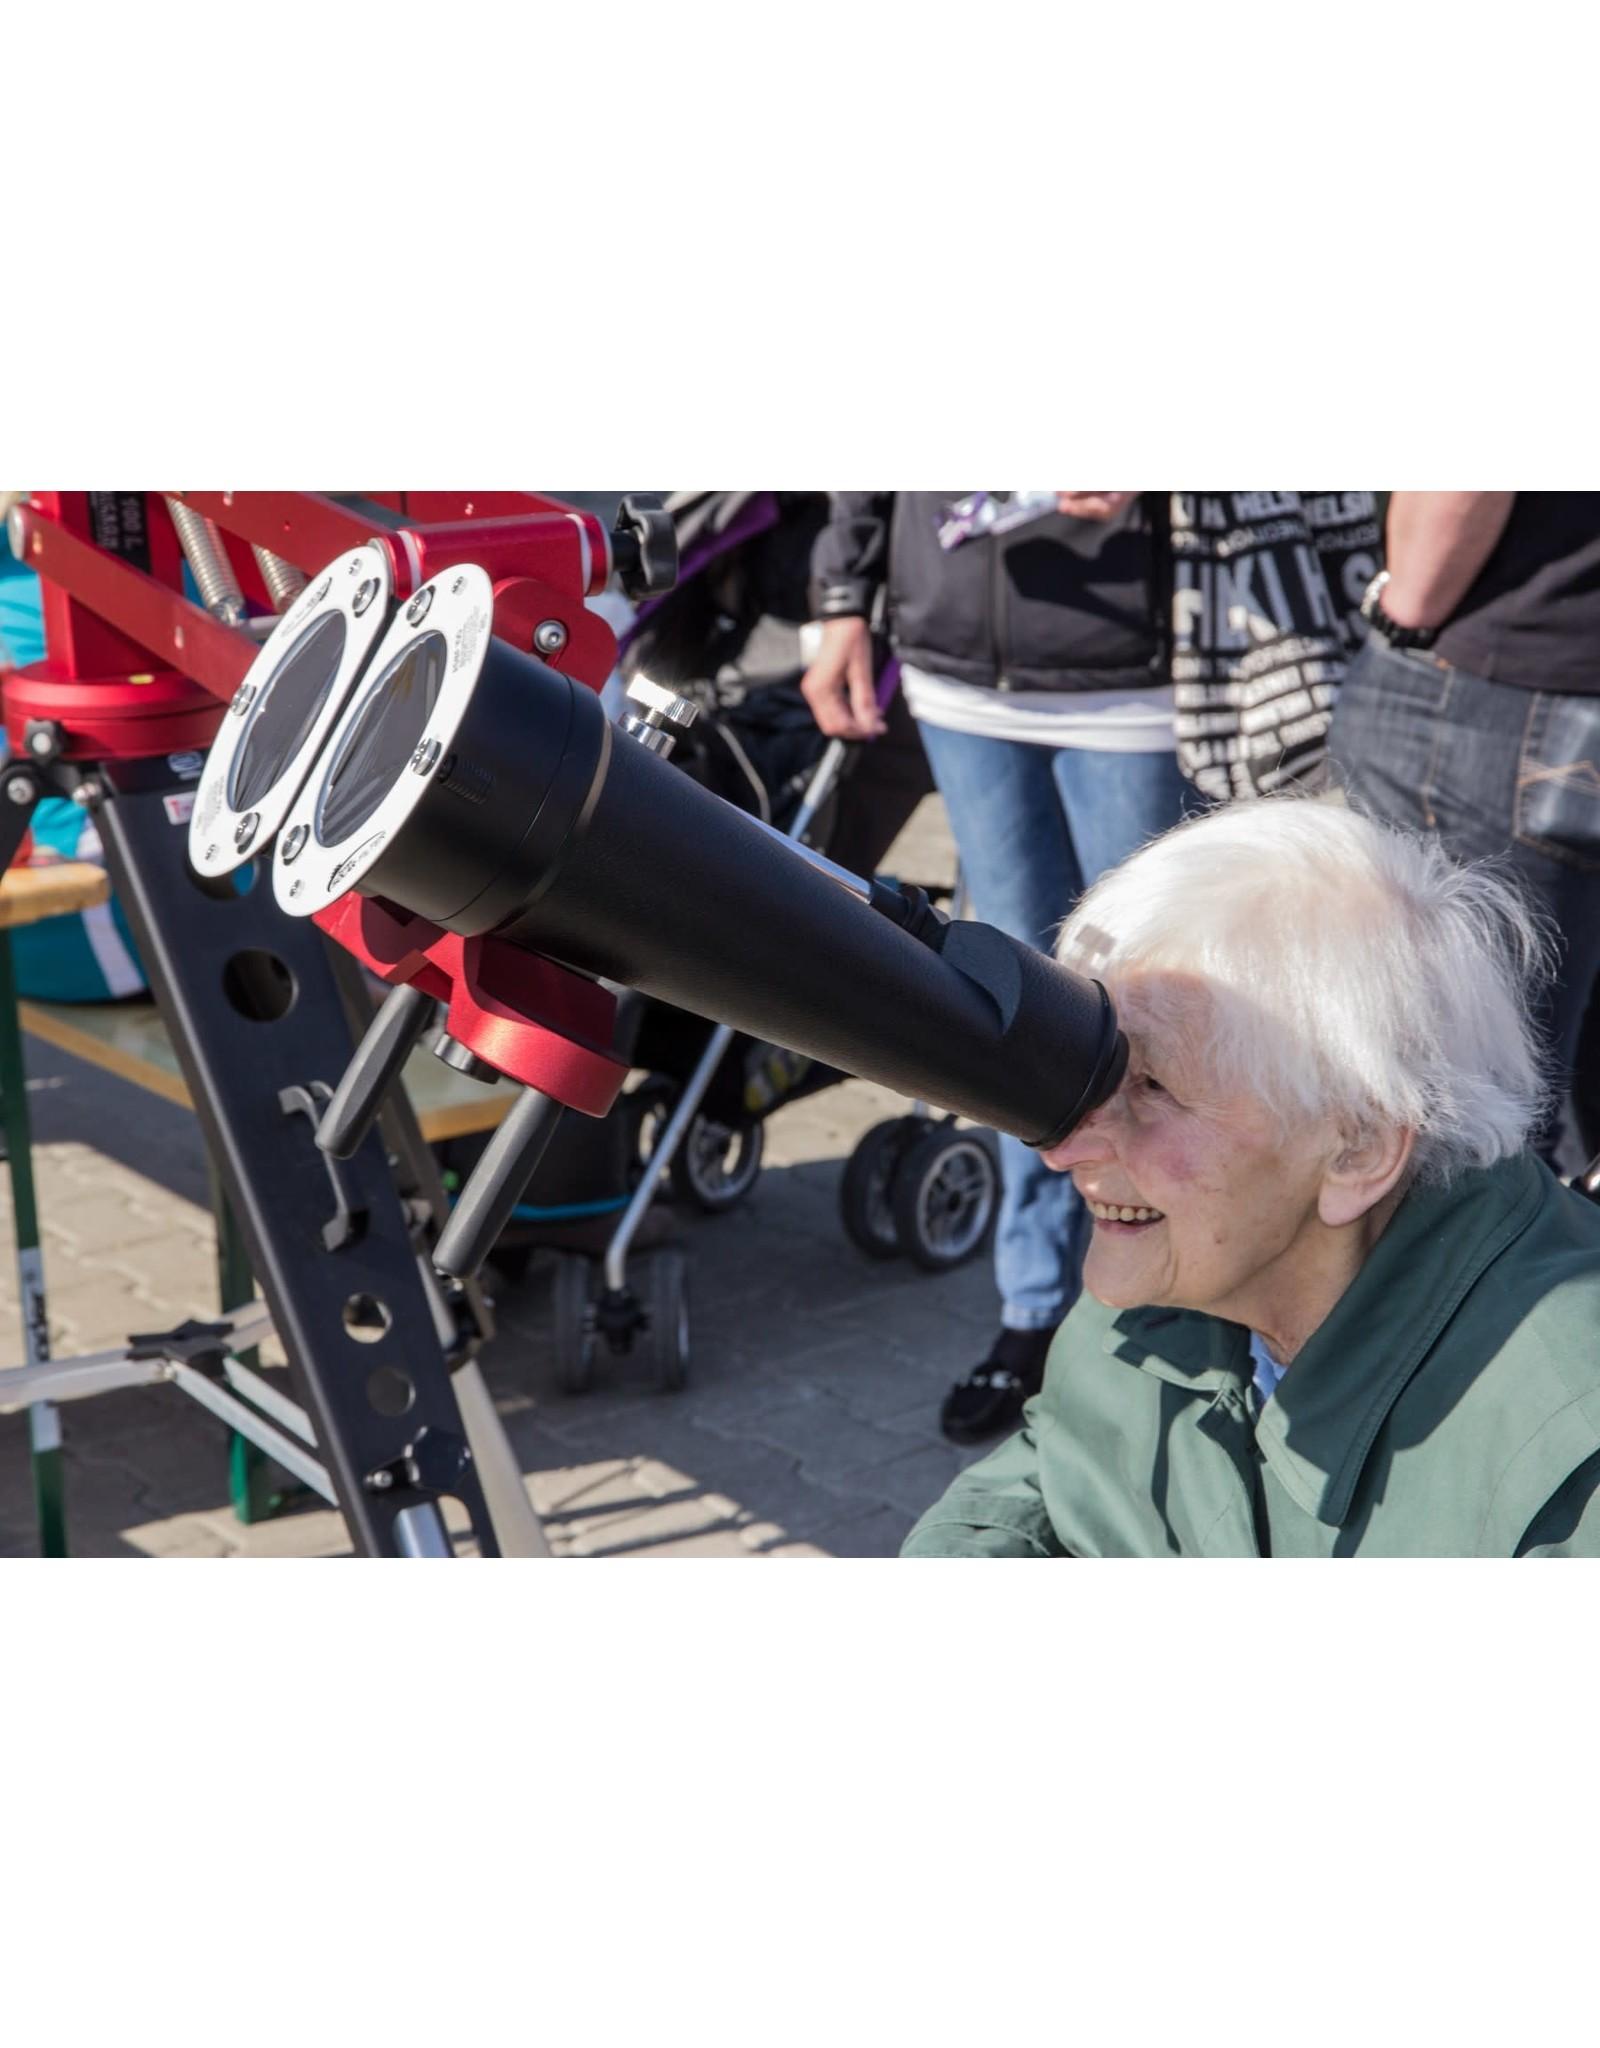 Baader Planetarium ASBF: AstroSolar Binocular Filter OD 5.0 (Specify Size)